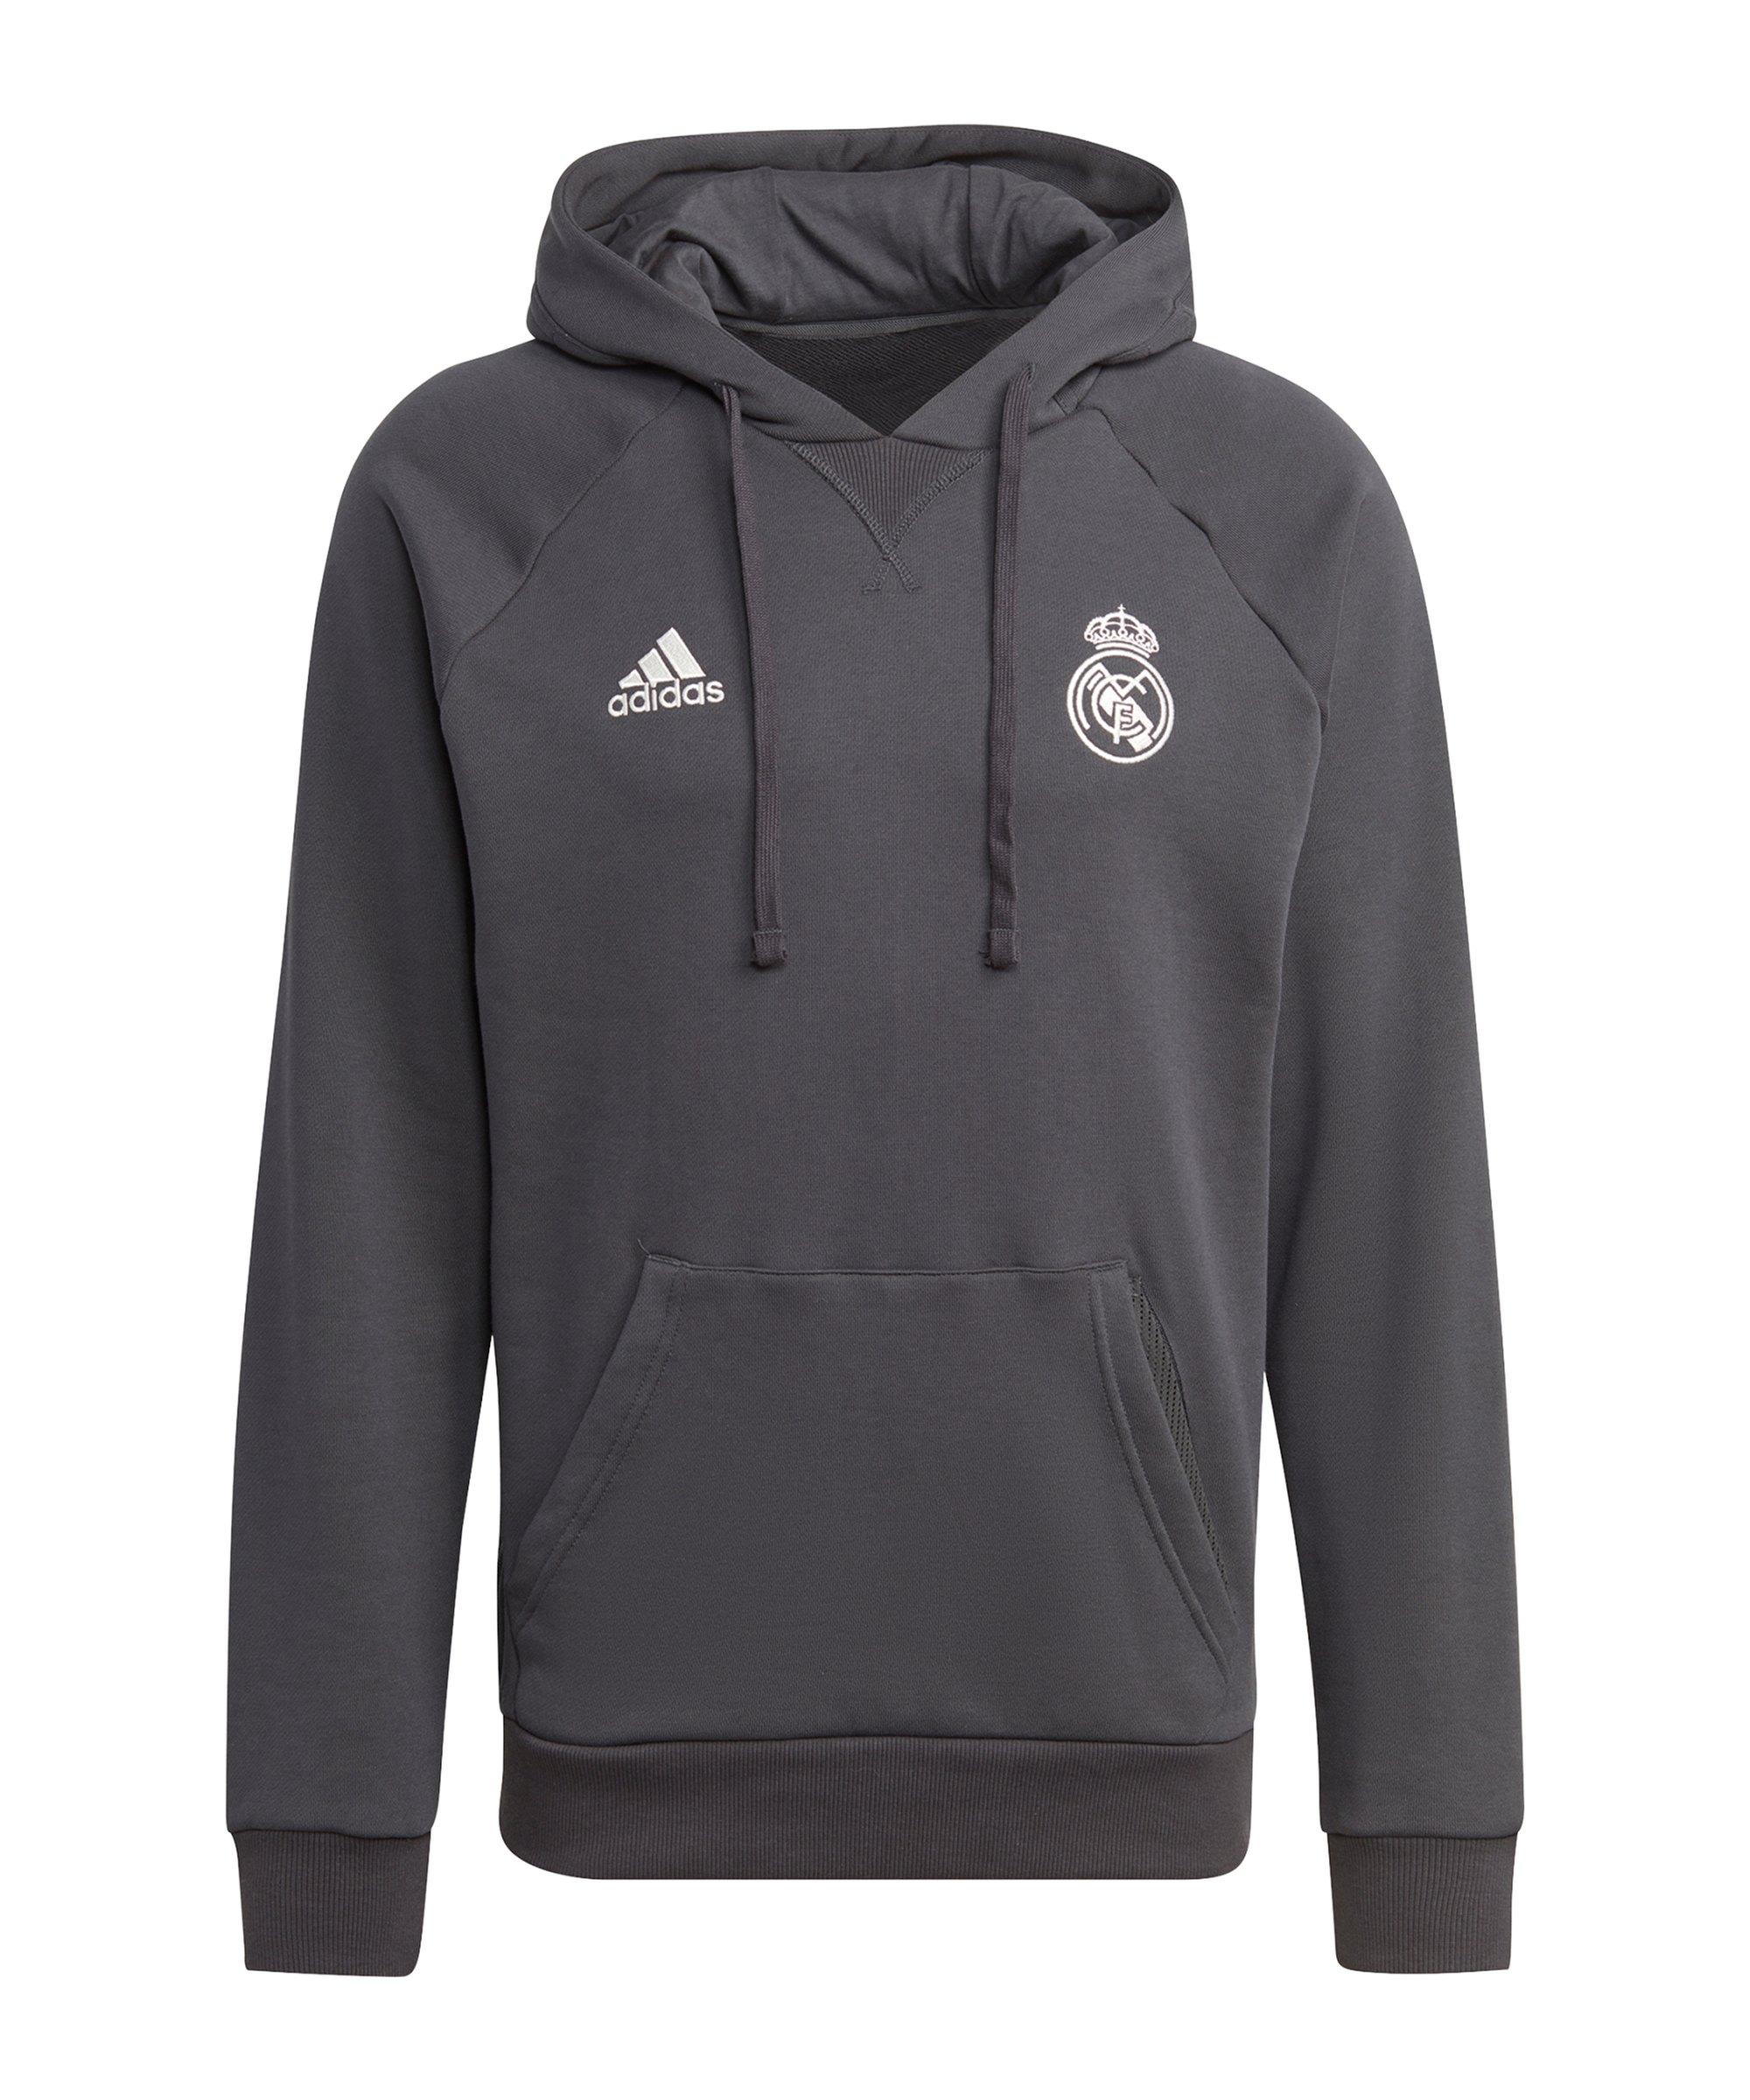 adidas Real Madrid Hoody Schwarz - schwarz